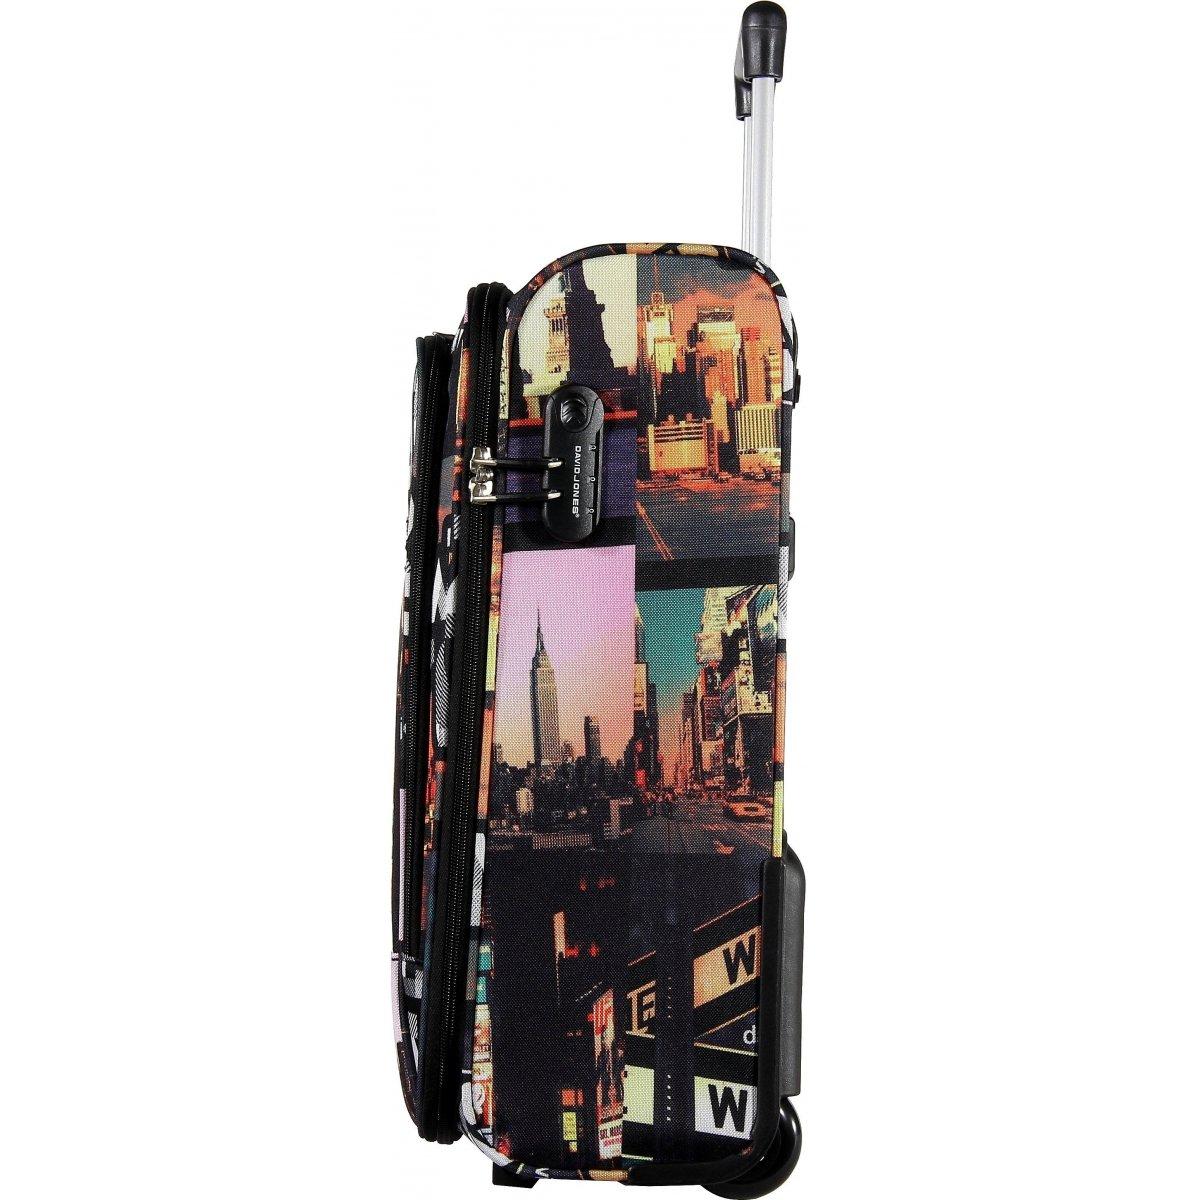 valise cabine ryanair david jones r20031 couleur principale new york promotion. Black Bedroom Furniture Sets. Home Design Ideas